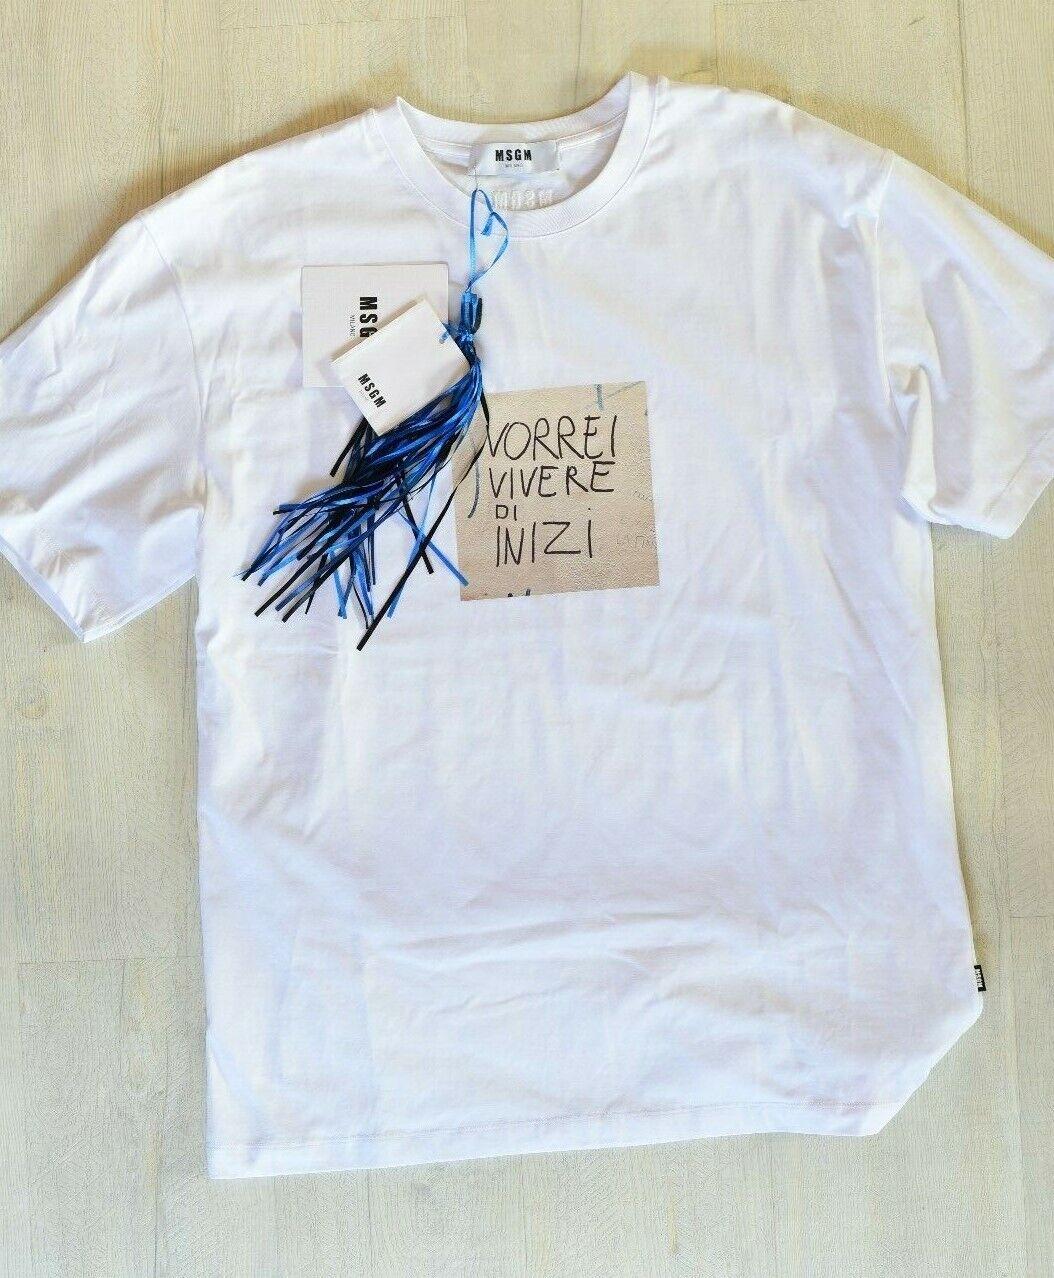 MSGM T-hemd, Brand New, Größe L OverGröße, 100% Authentic, Made in